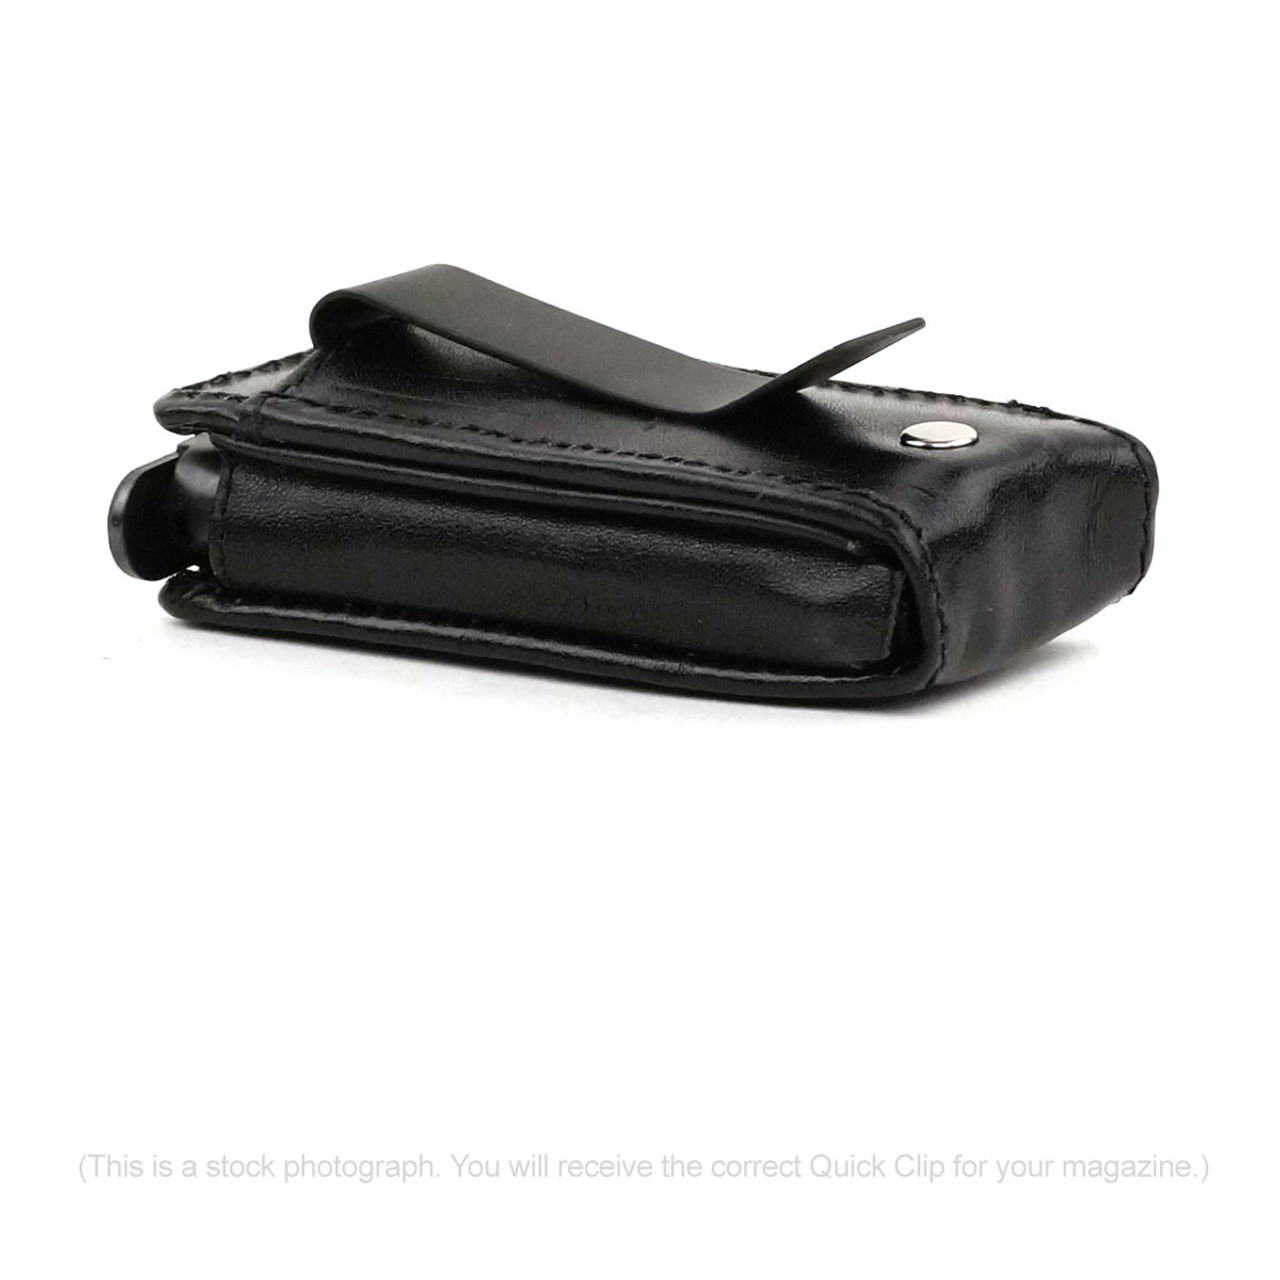 Glock 48 Quick Clip Magazine Holster